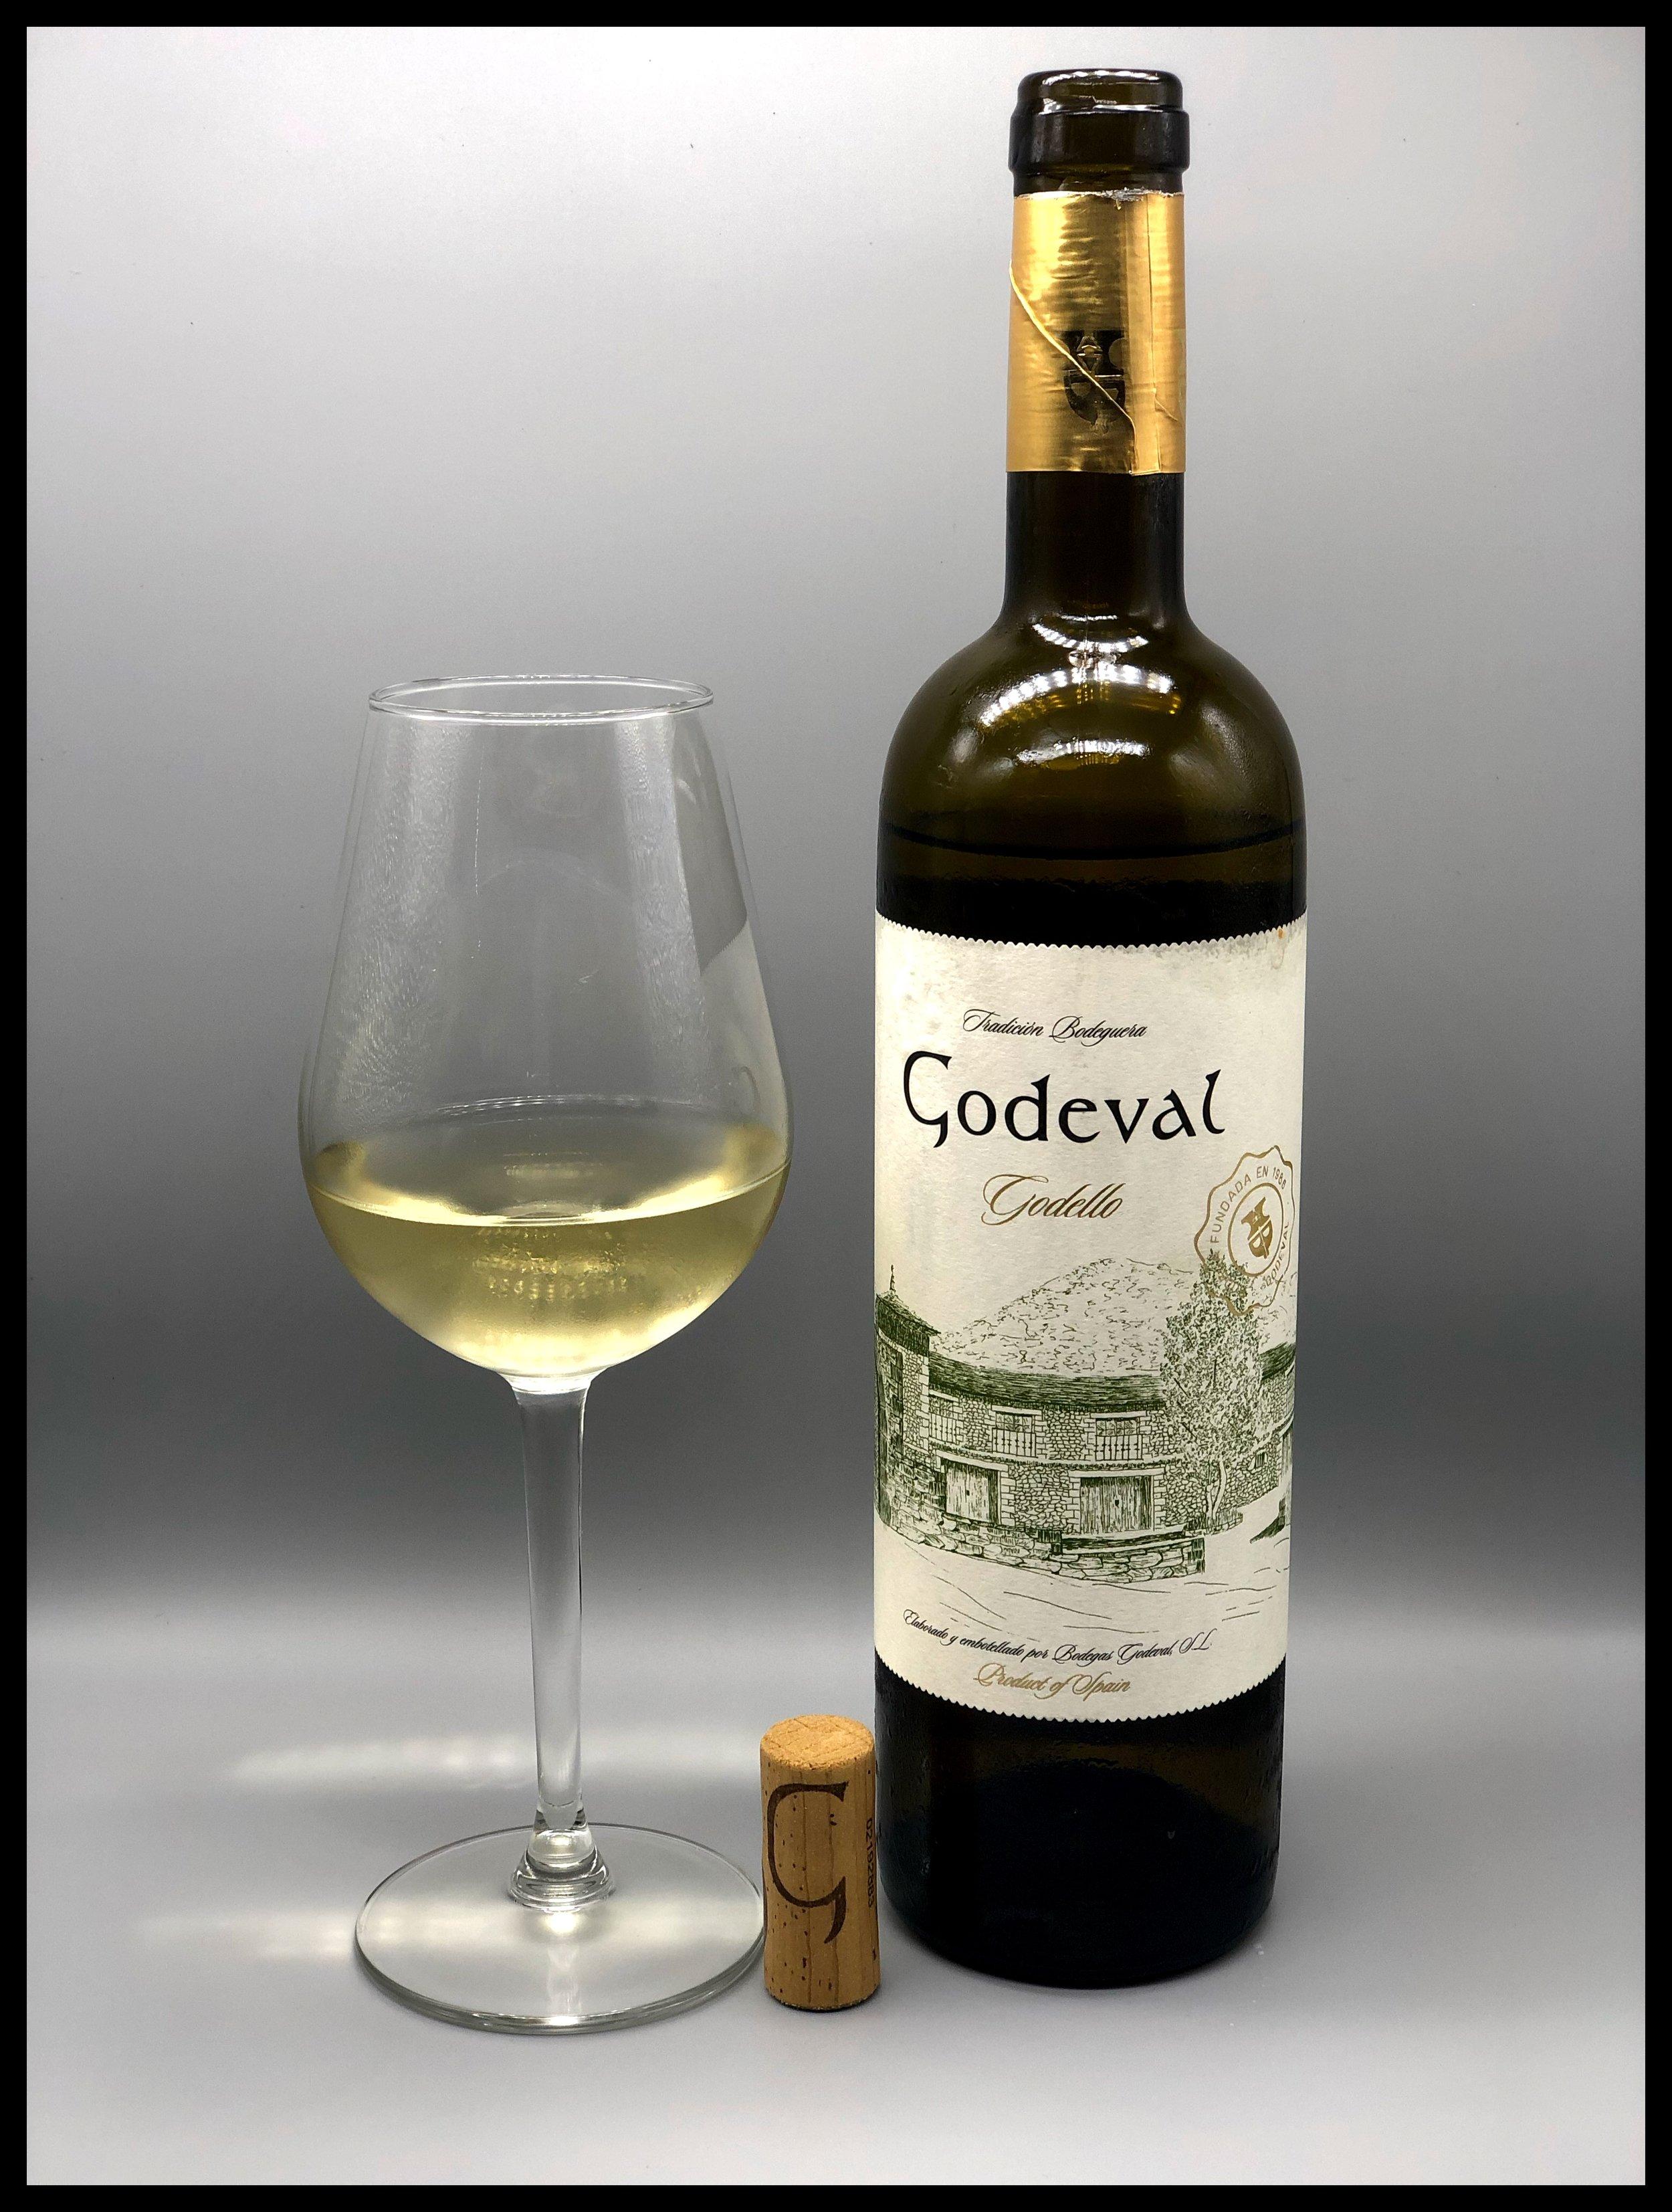 Godeval with Wine.jpg